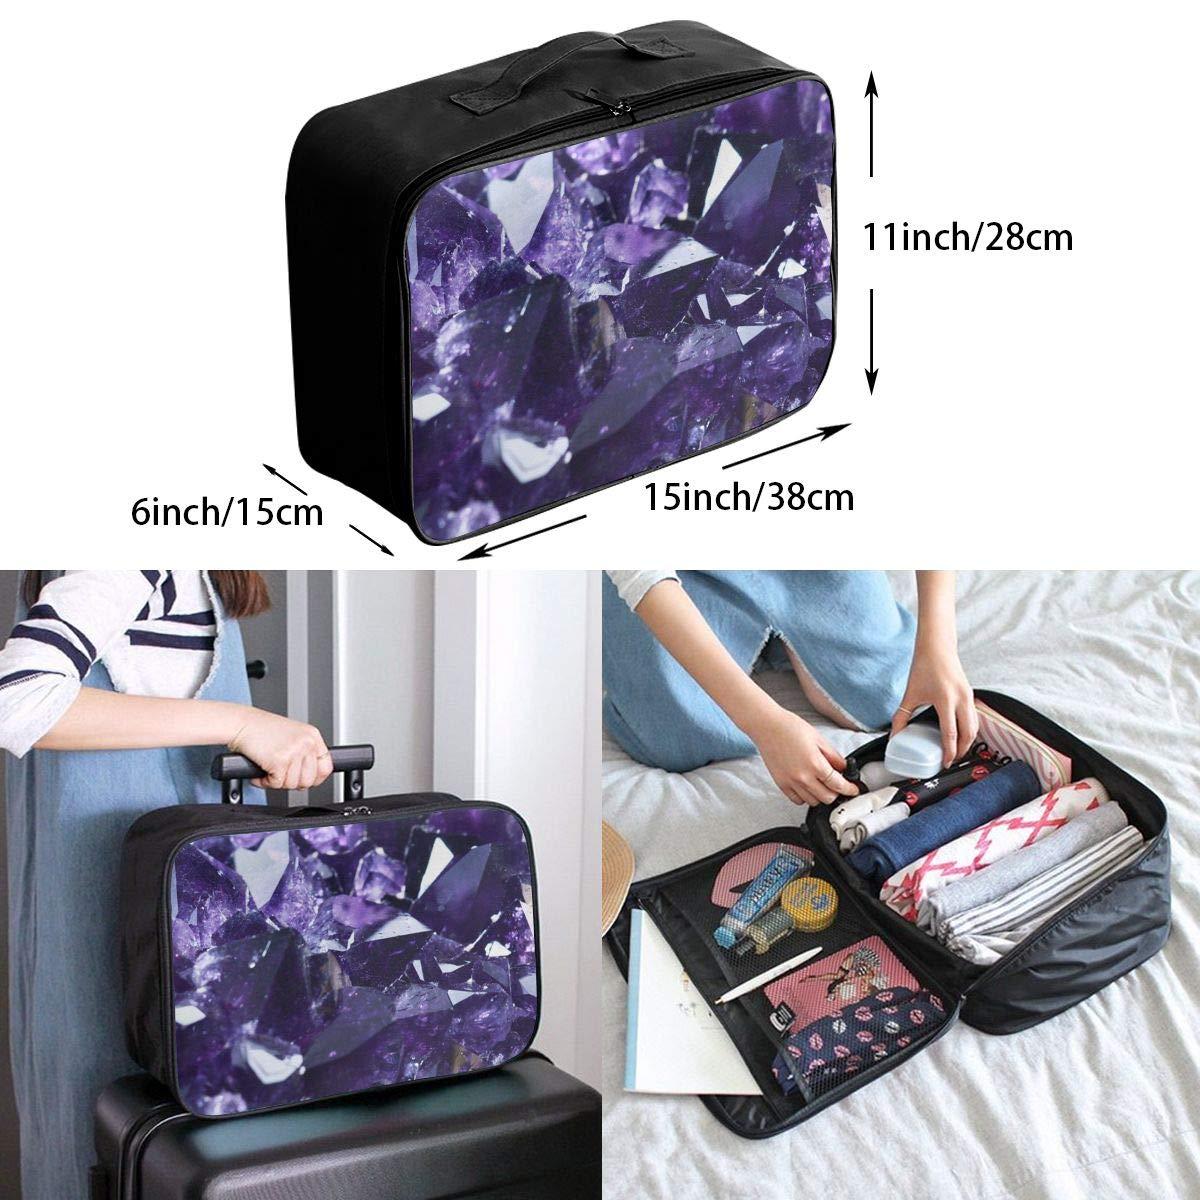 Travel Luggage Duffle Bag Lightweight Portable Handbag Purple Crystal Sponge Print Large Capacity Waterproof Foldable Storage Tote